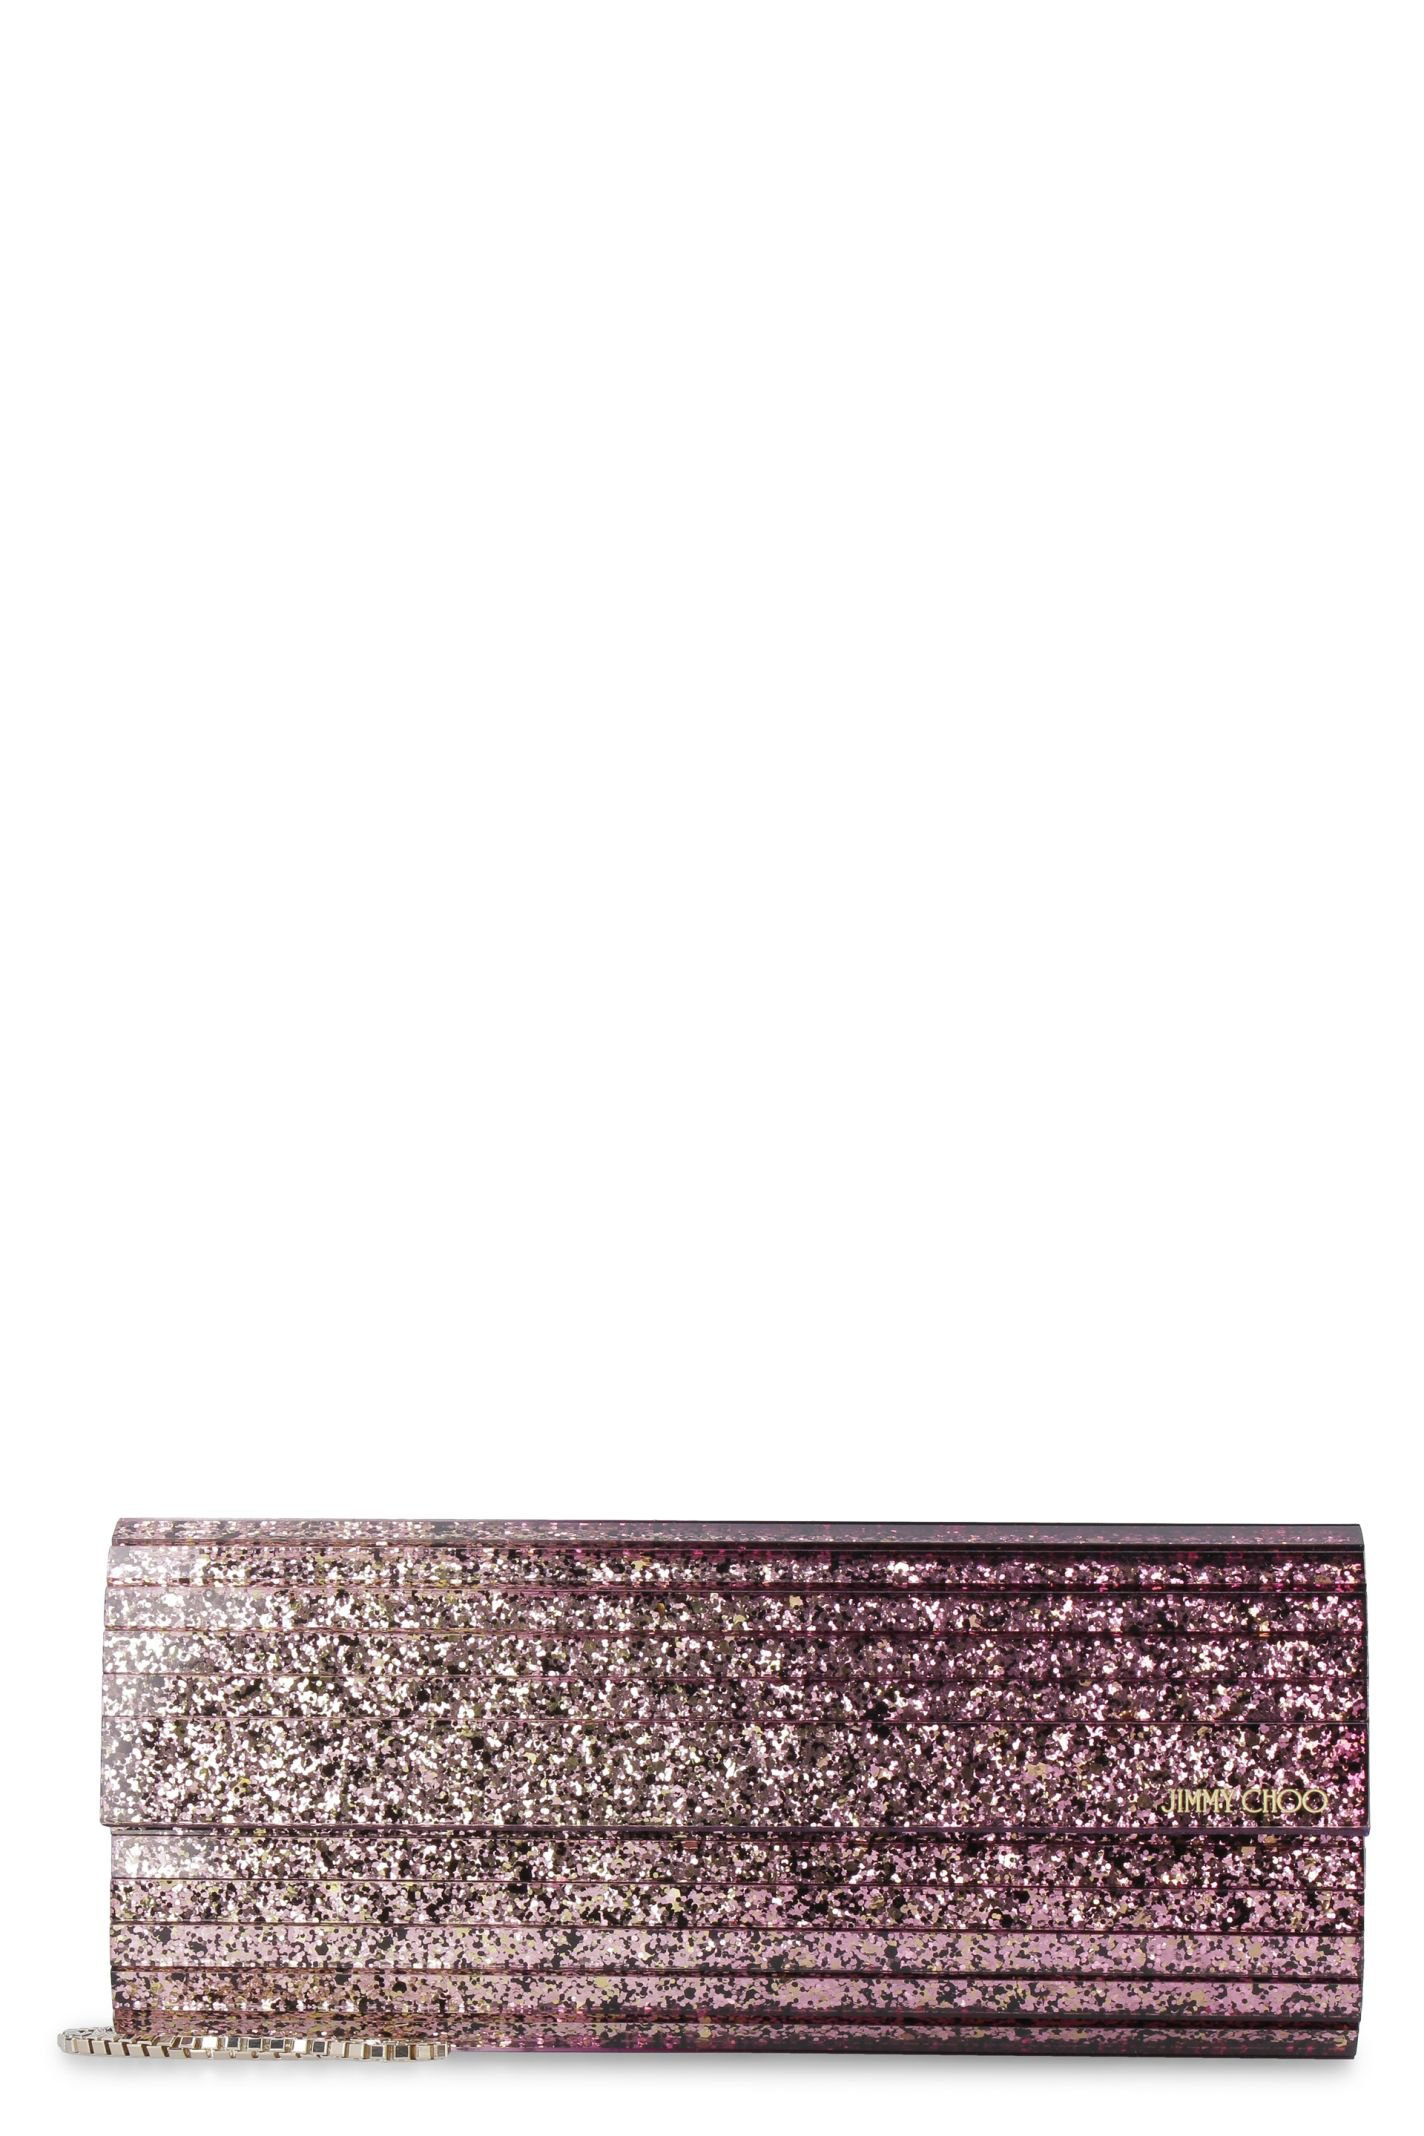 Jimmy Choo Sweetie Glitter Acrylic Box Clutch